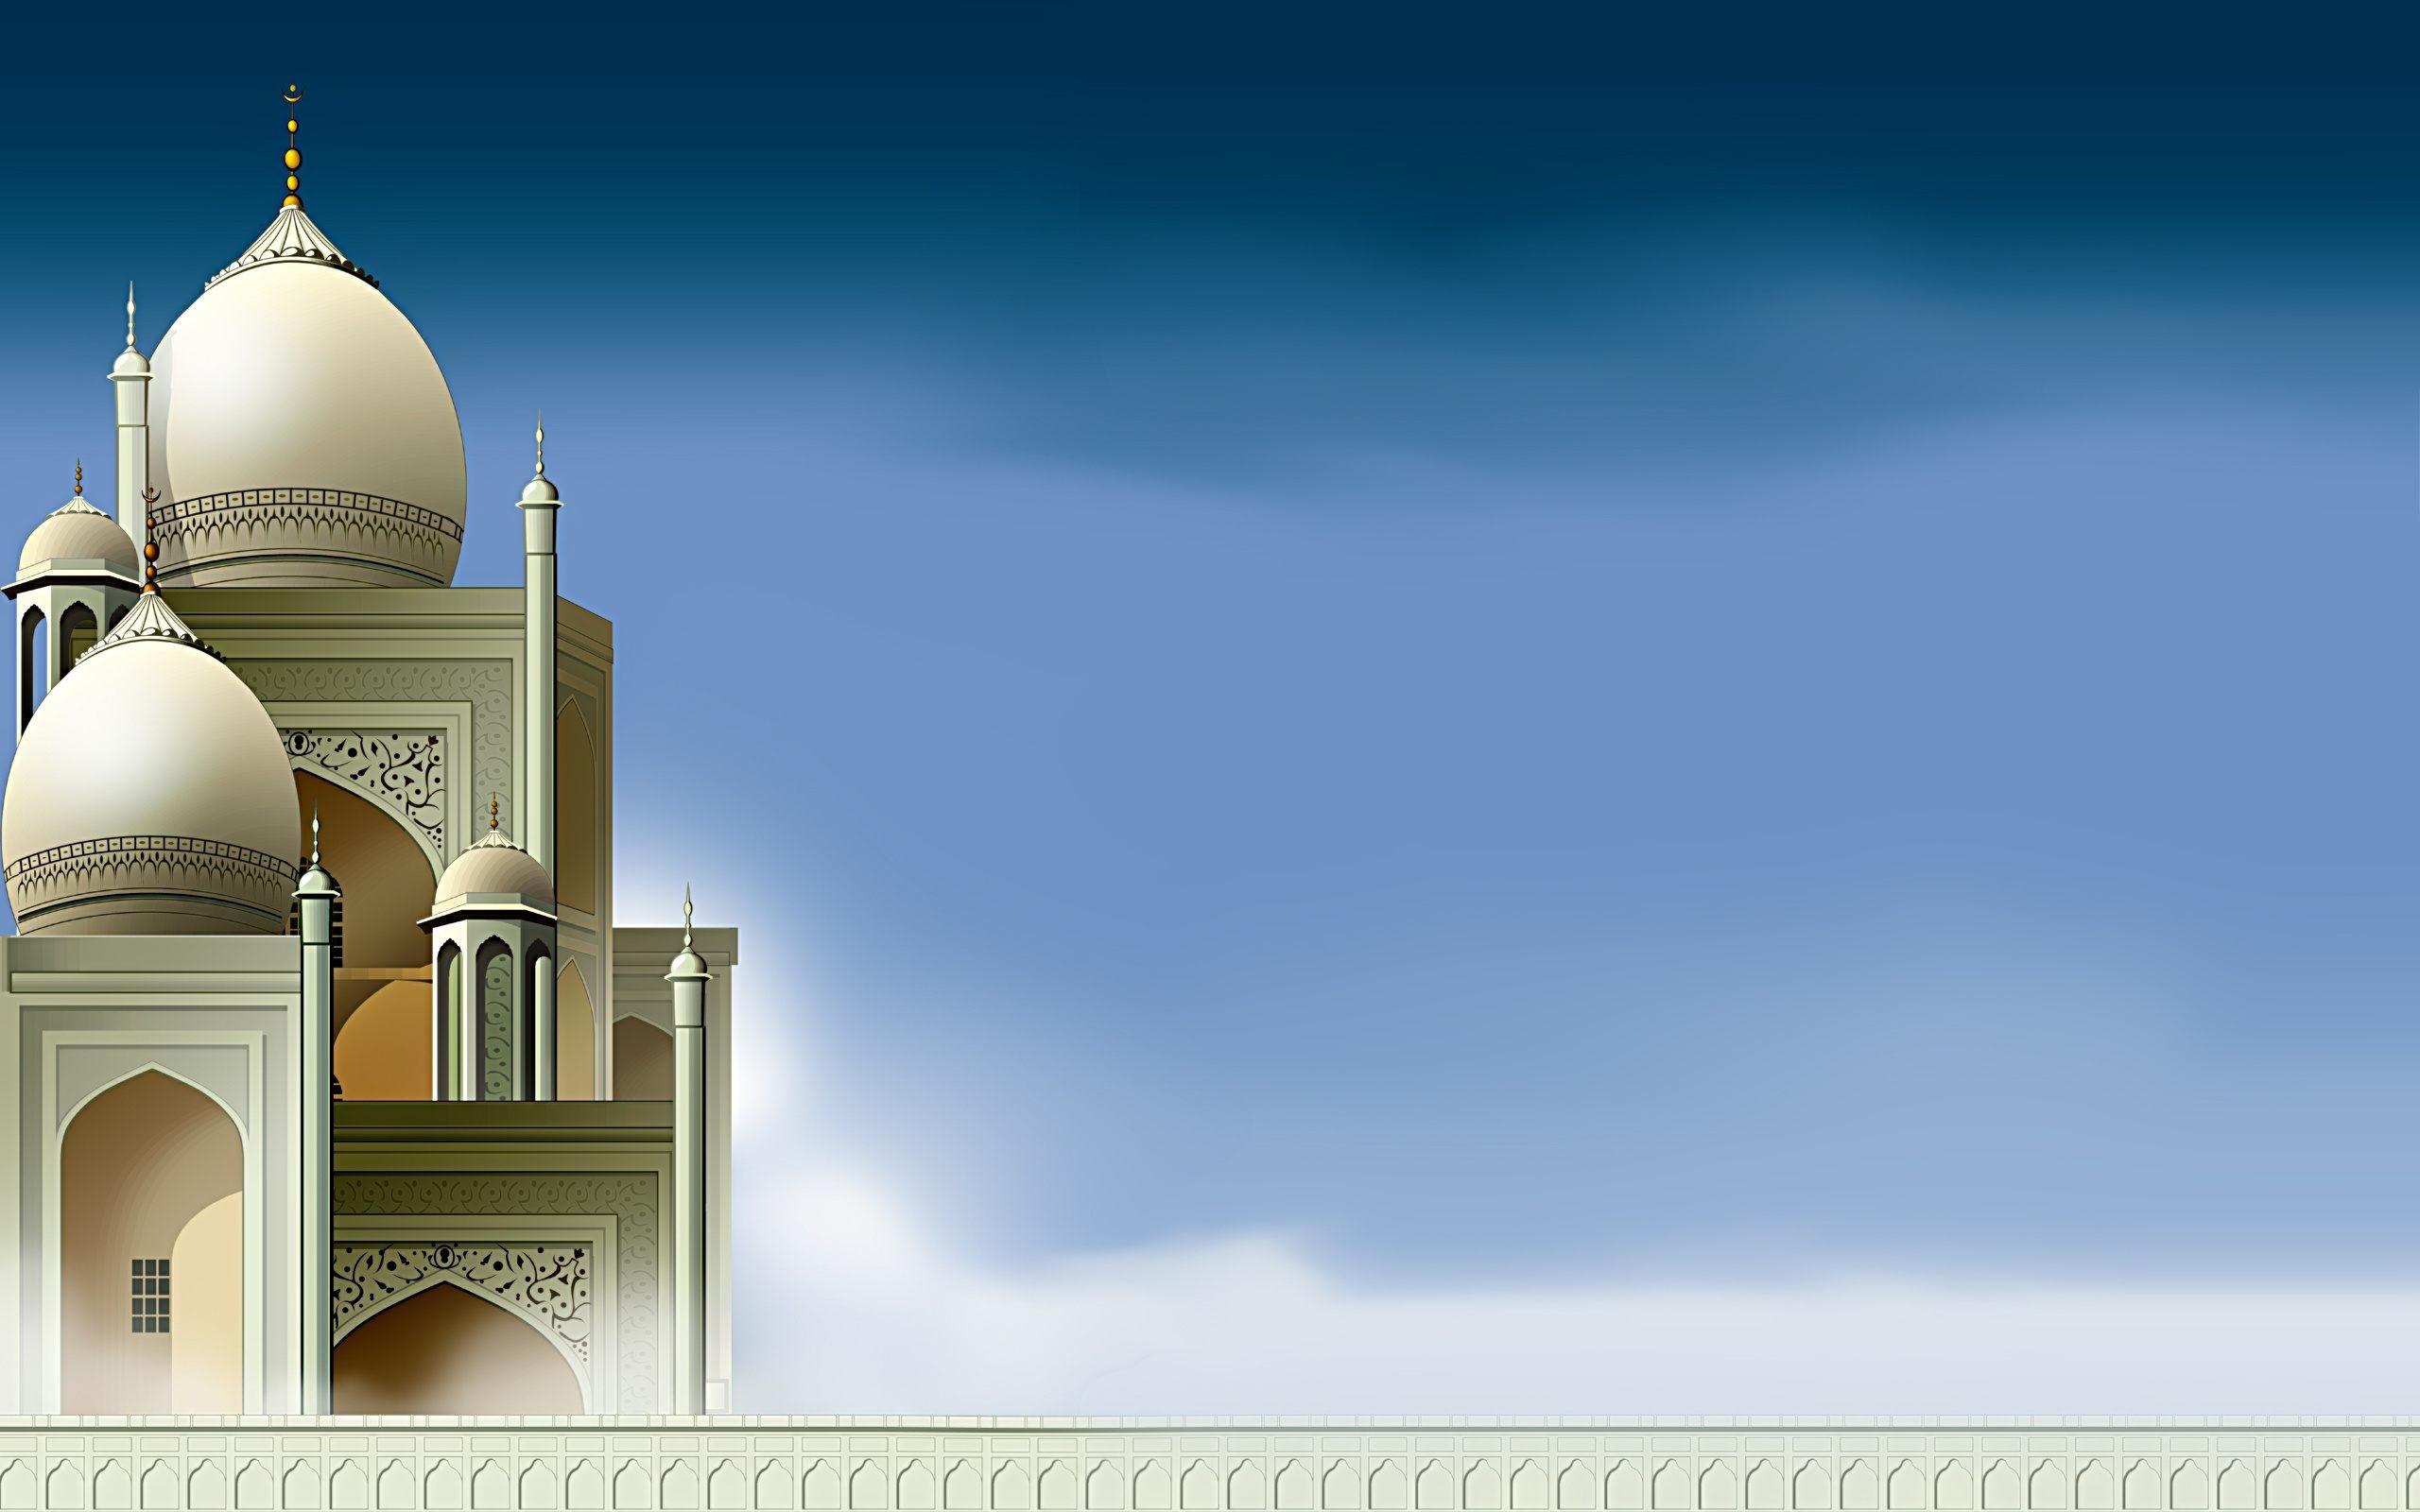 Islamic Wallpaper Hd Download Full Wallpaper Of Masjid 53 Images